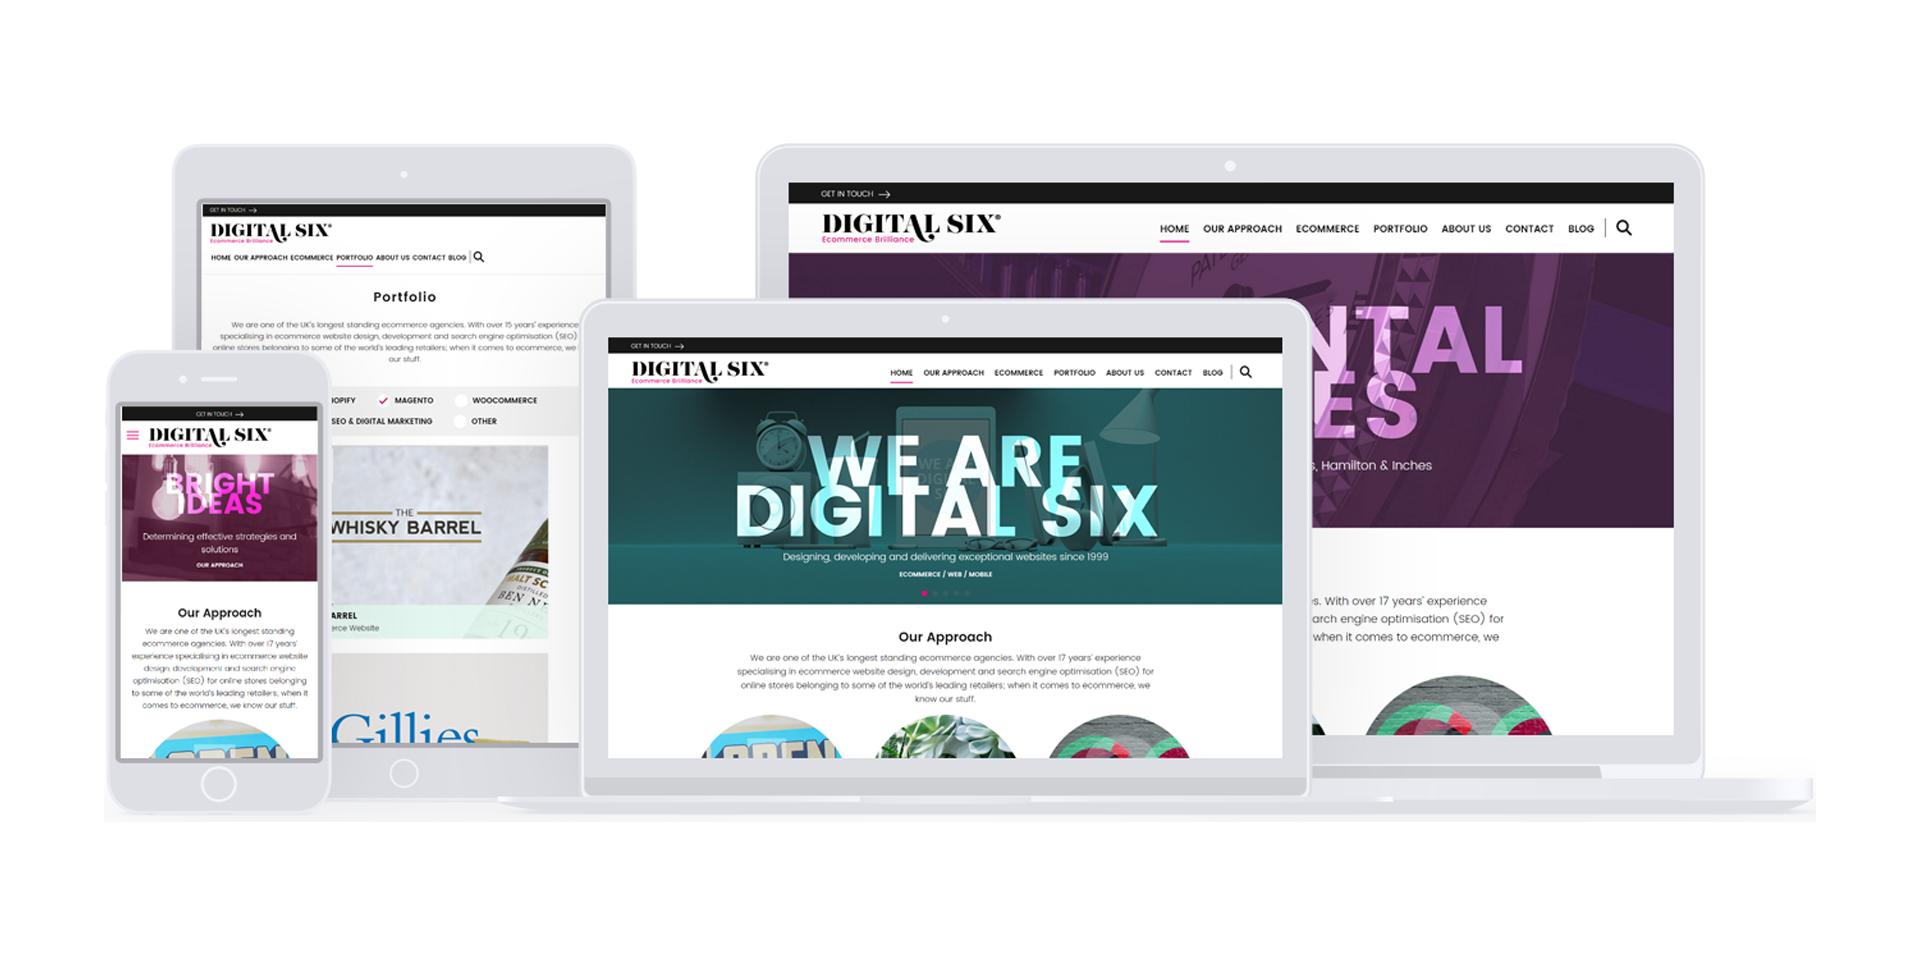 New Digital Six website